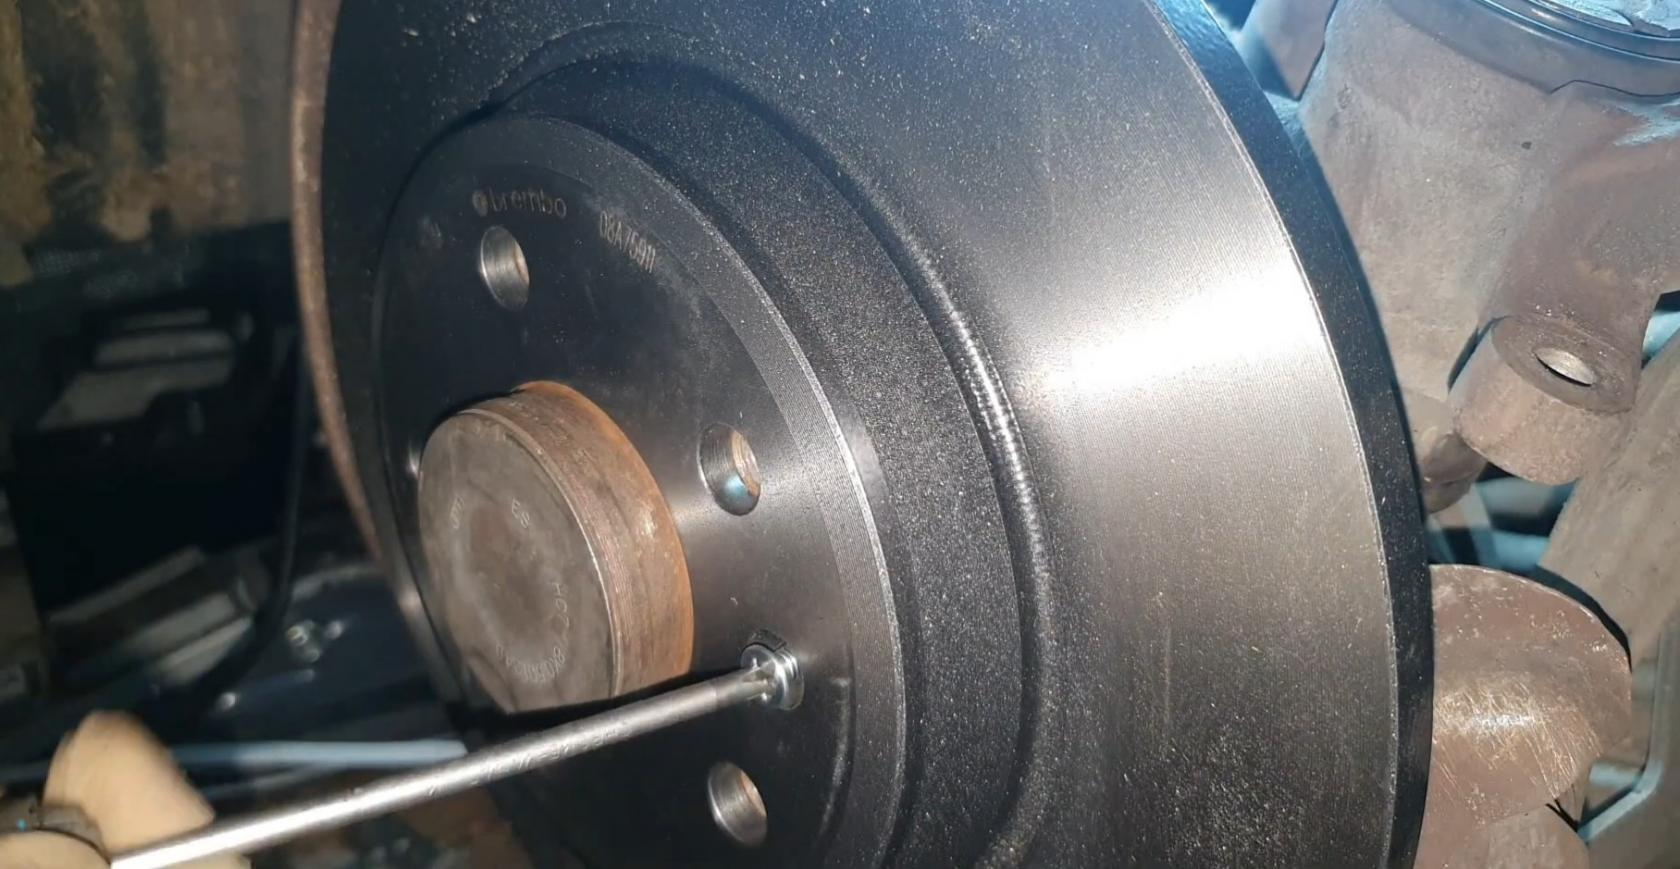 AudiA5-Tuto-disquesetplaquettes-5.jpeg